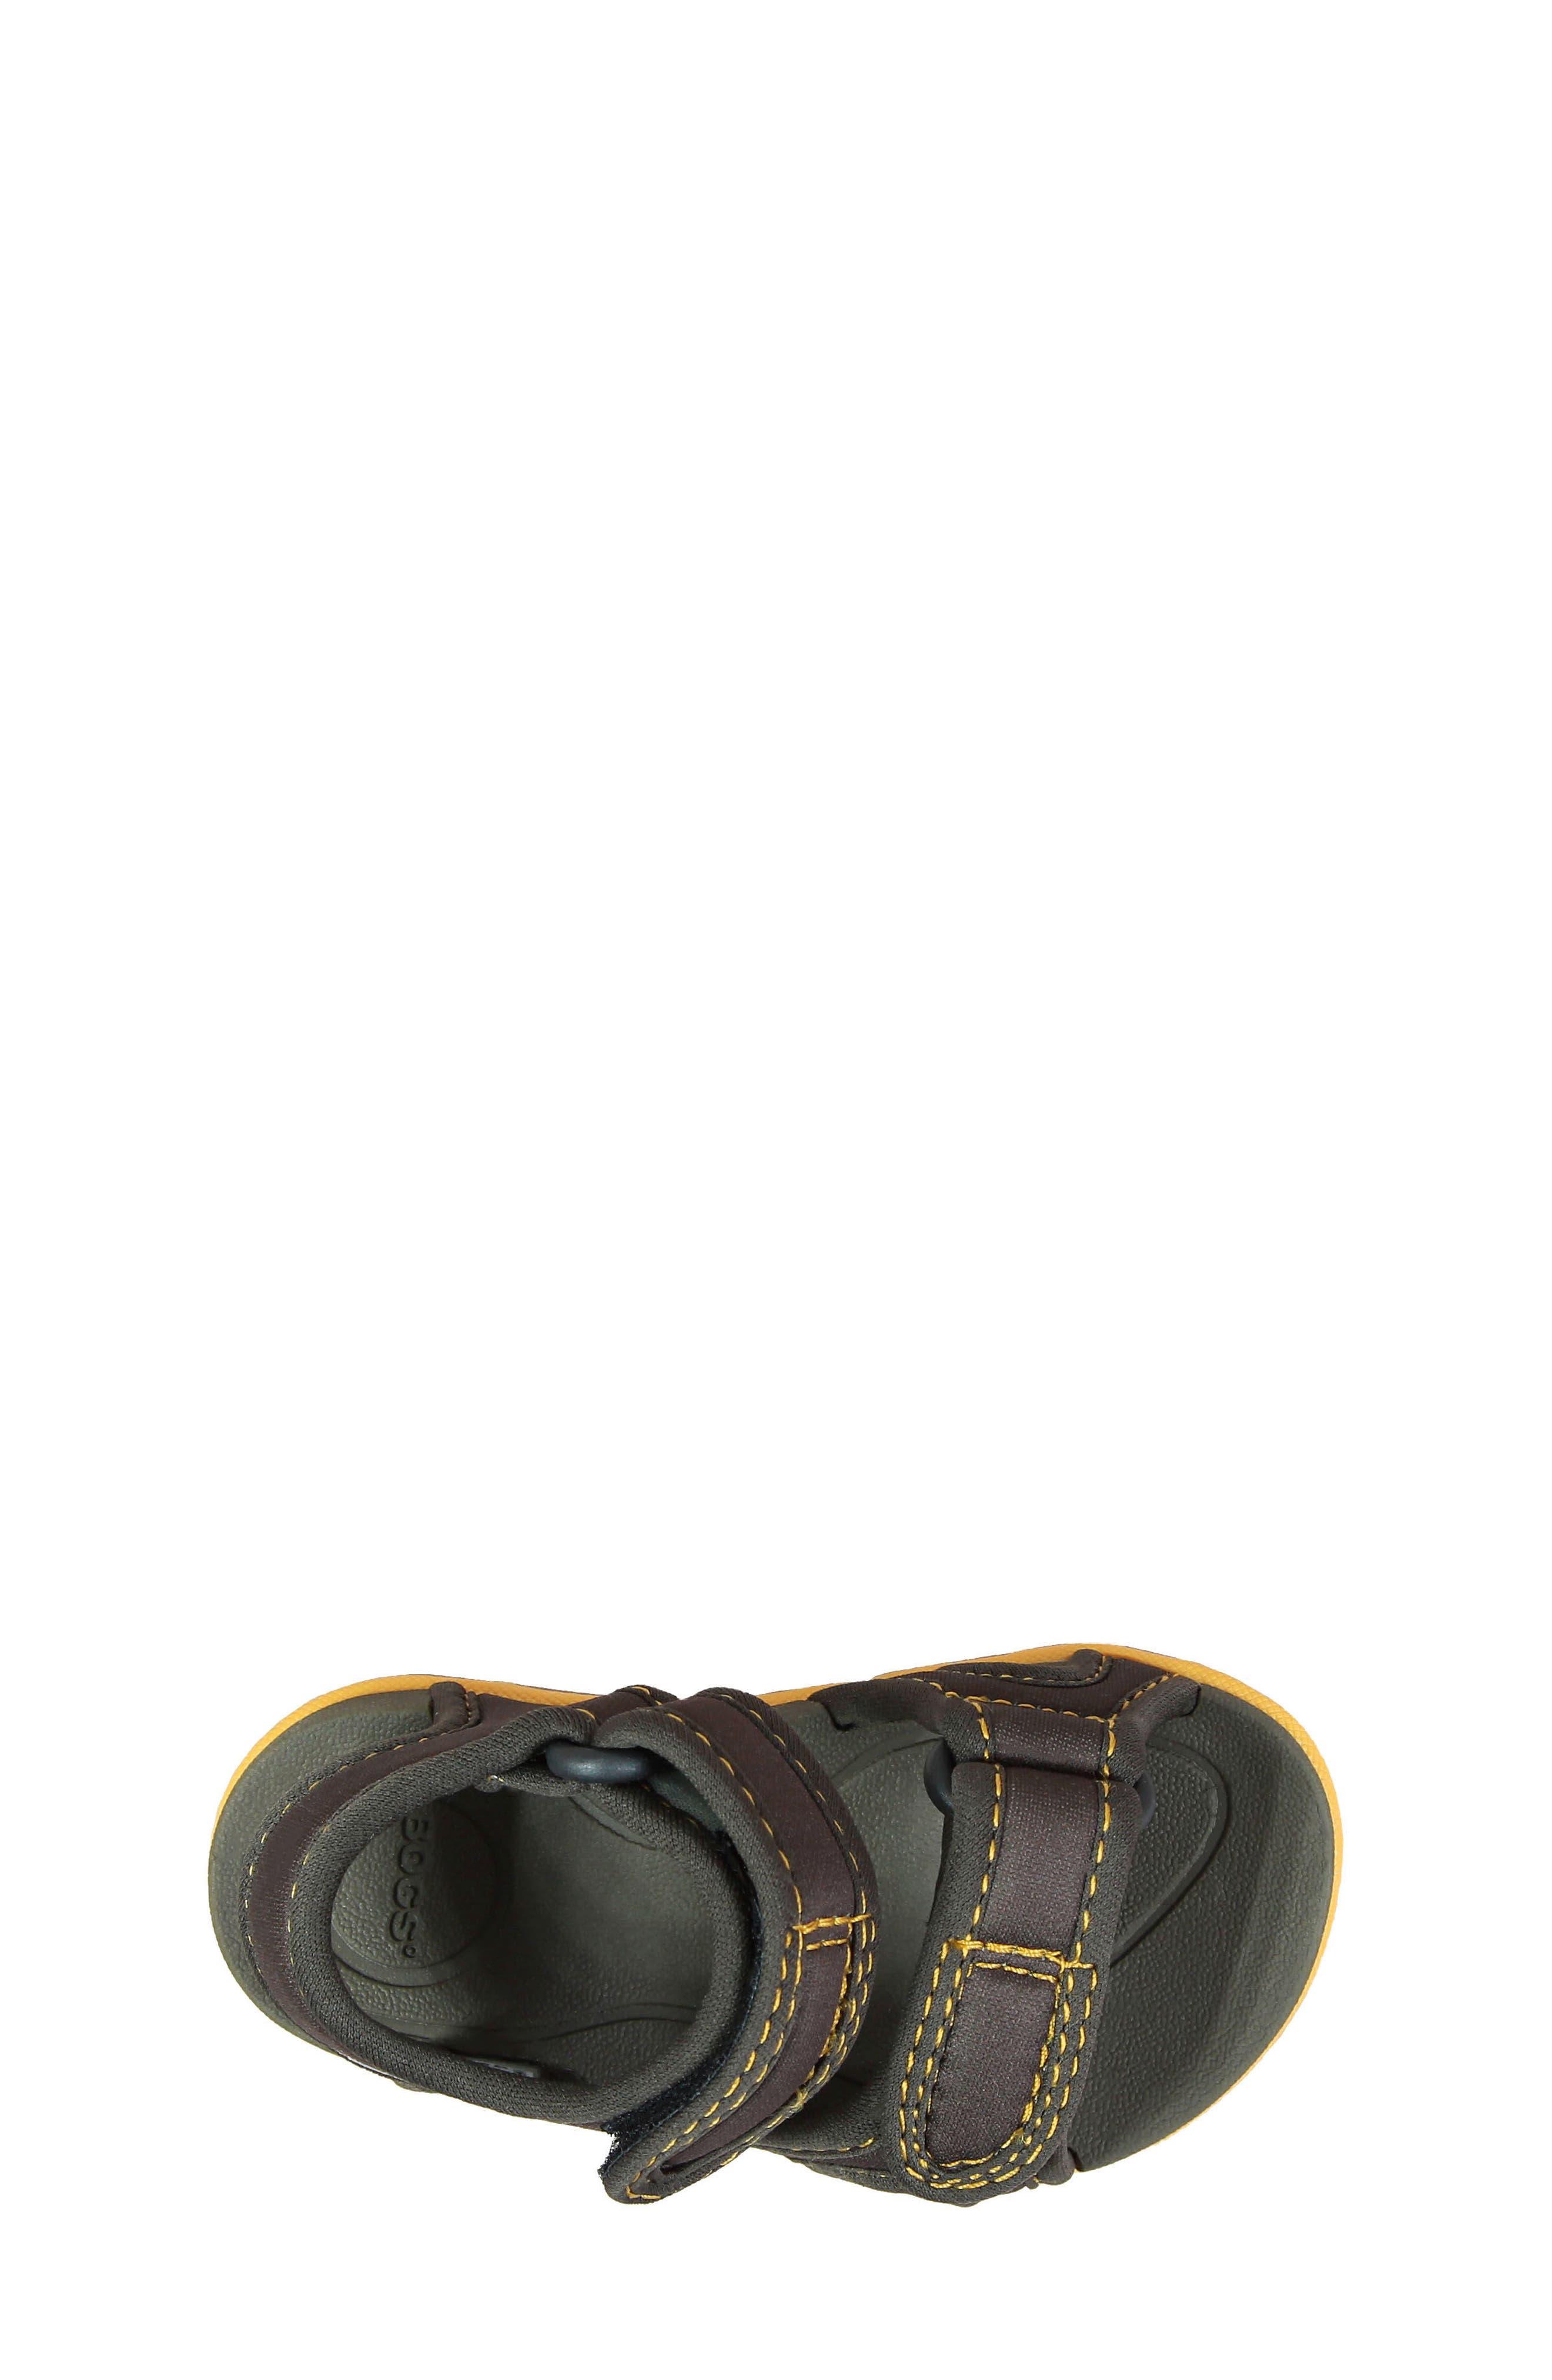 Whitefish Waterproof Sandal,                             Alternate thumbnail 5, color,                             Olive Multi